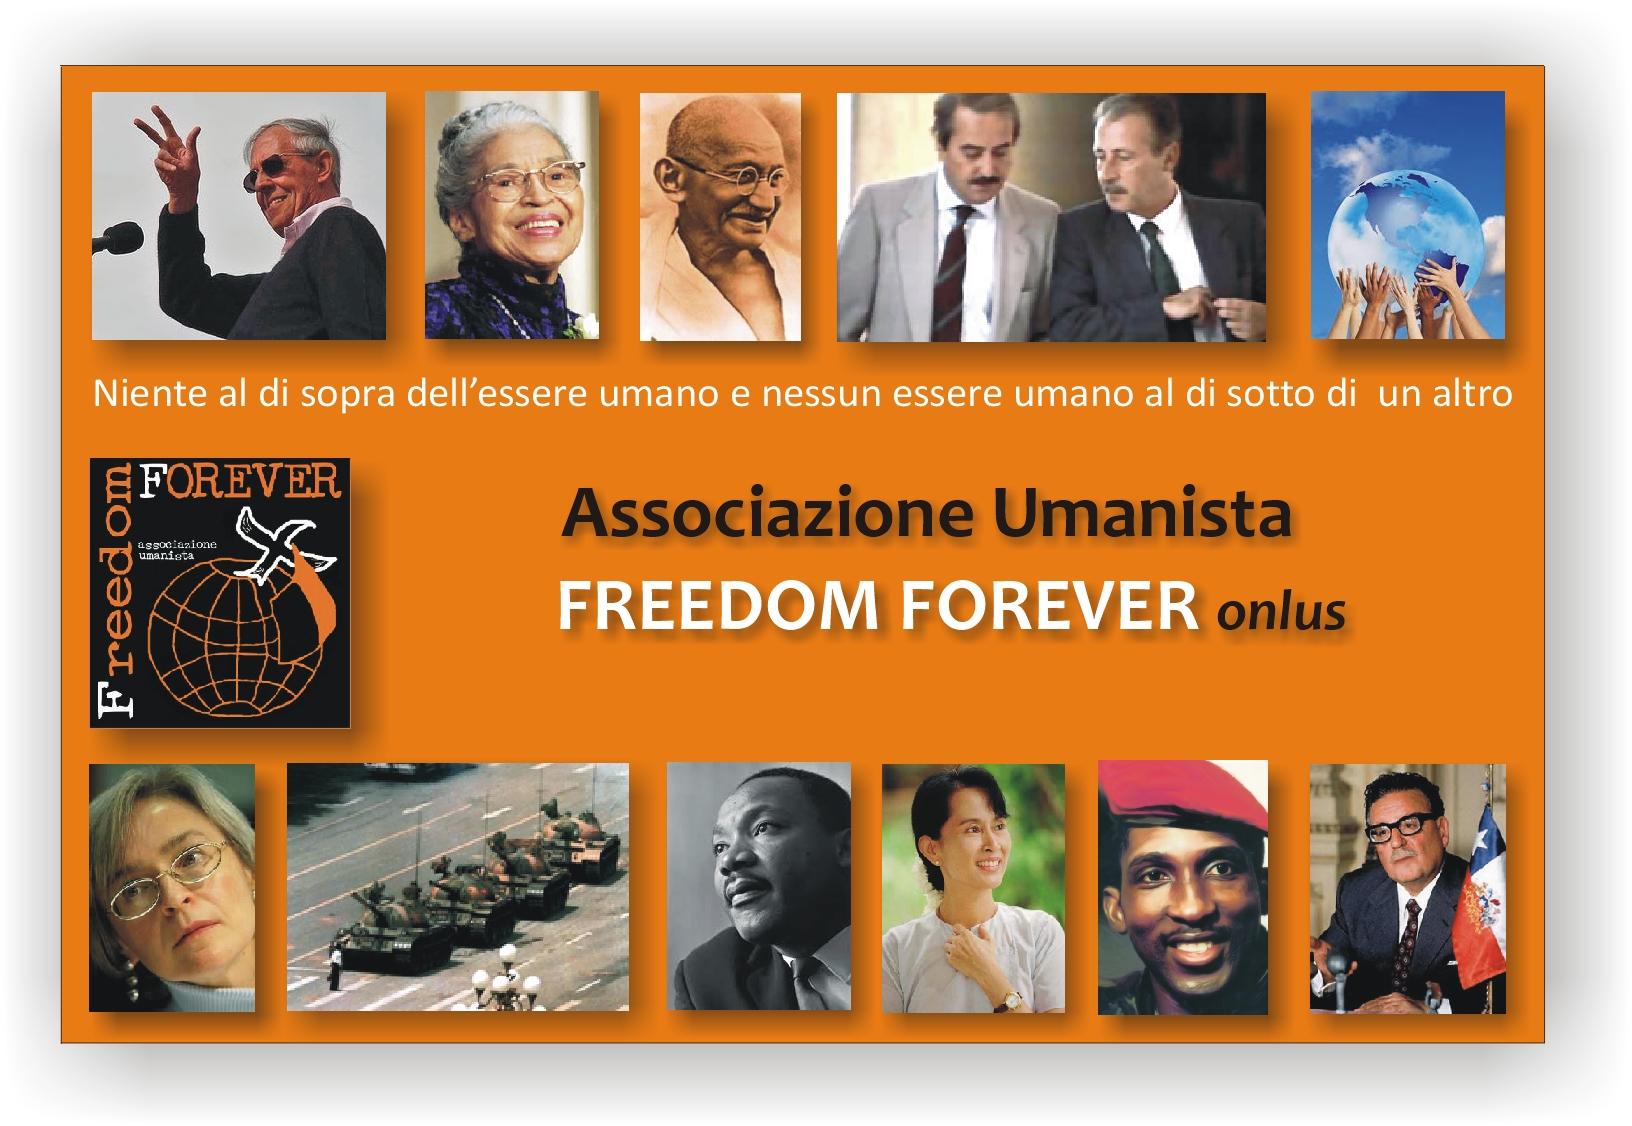 Associazione Umanista Freedom Forever